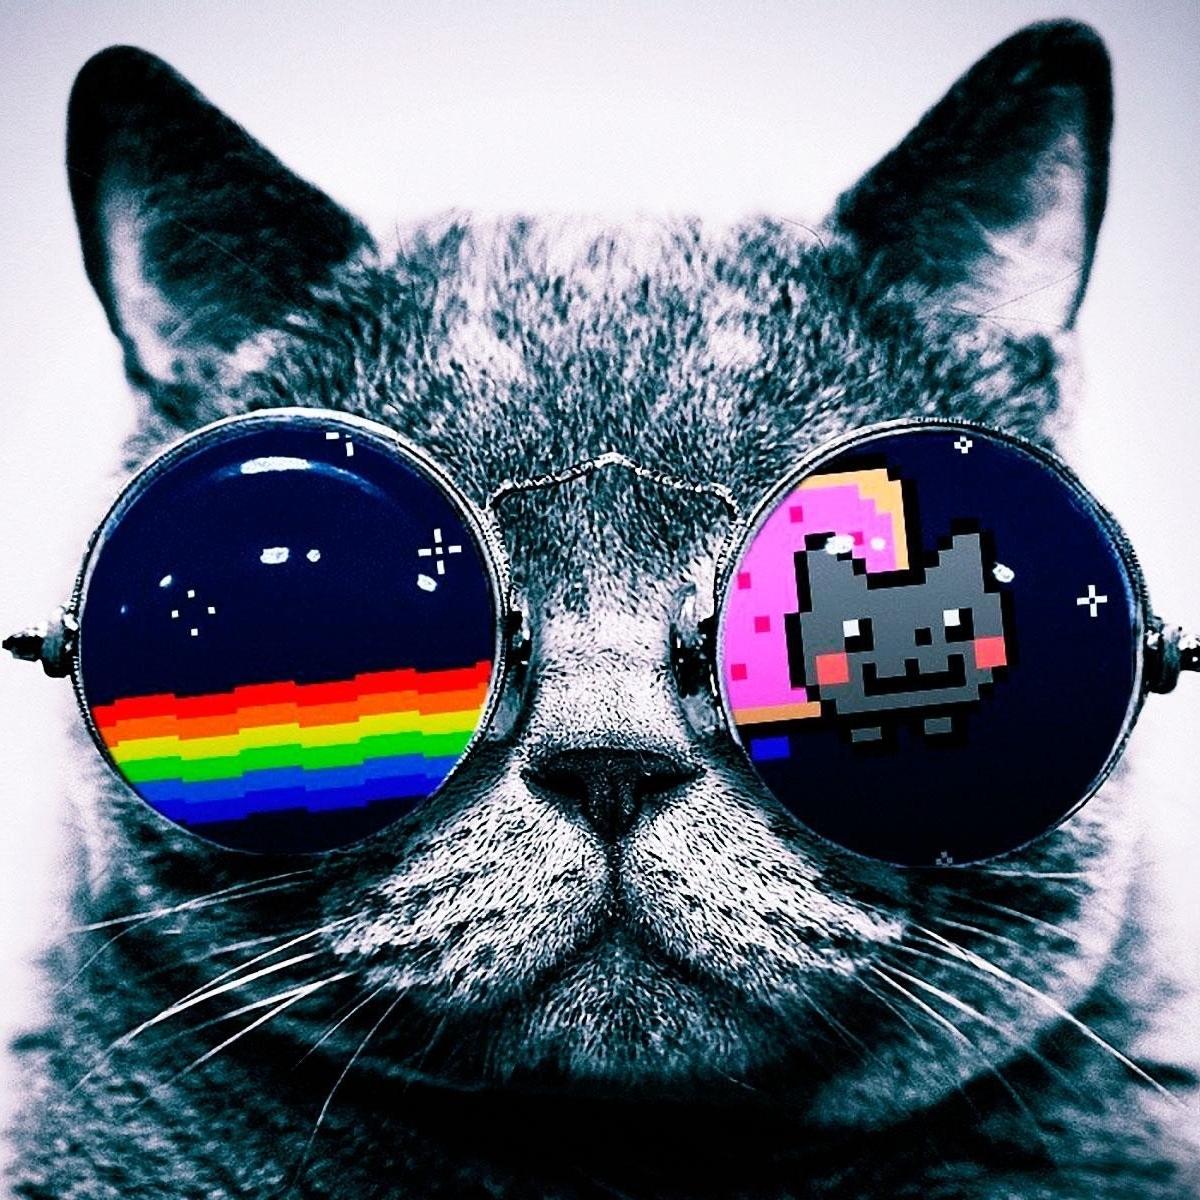 rainbowcatglasses.jpg